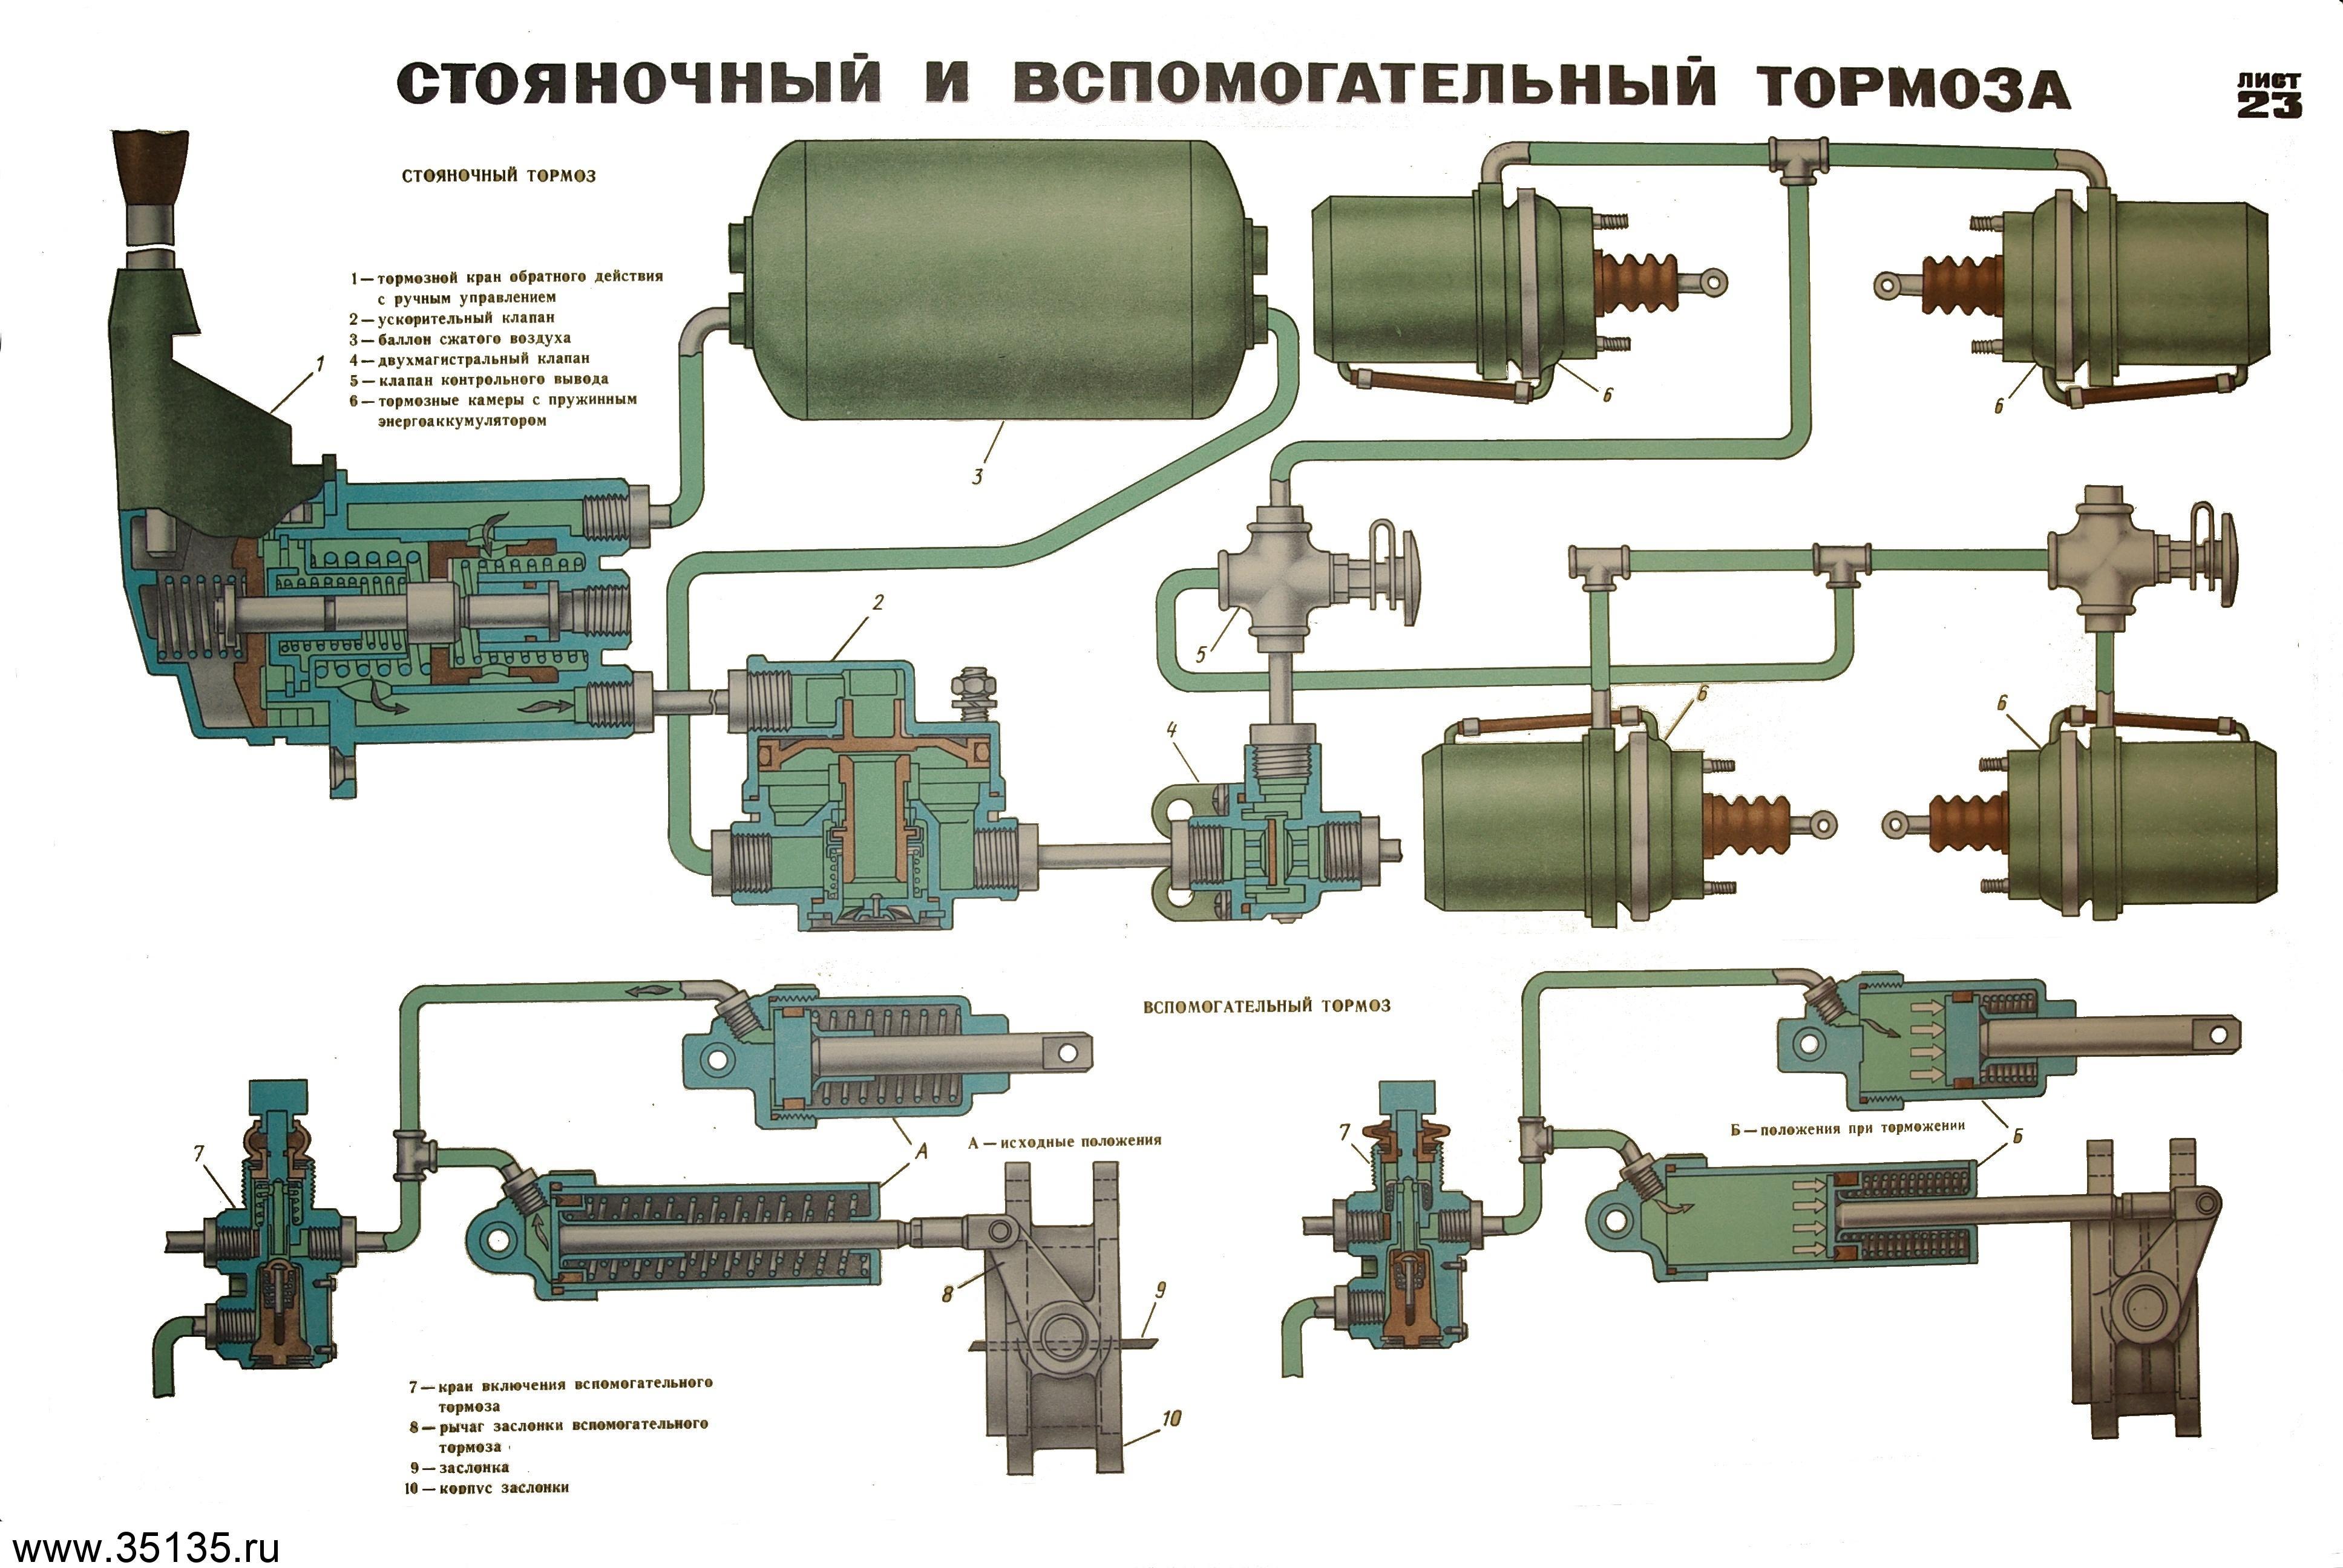 Схема передач МАЗ - kspecmash.ru